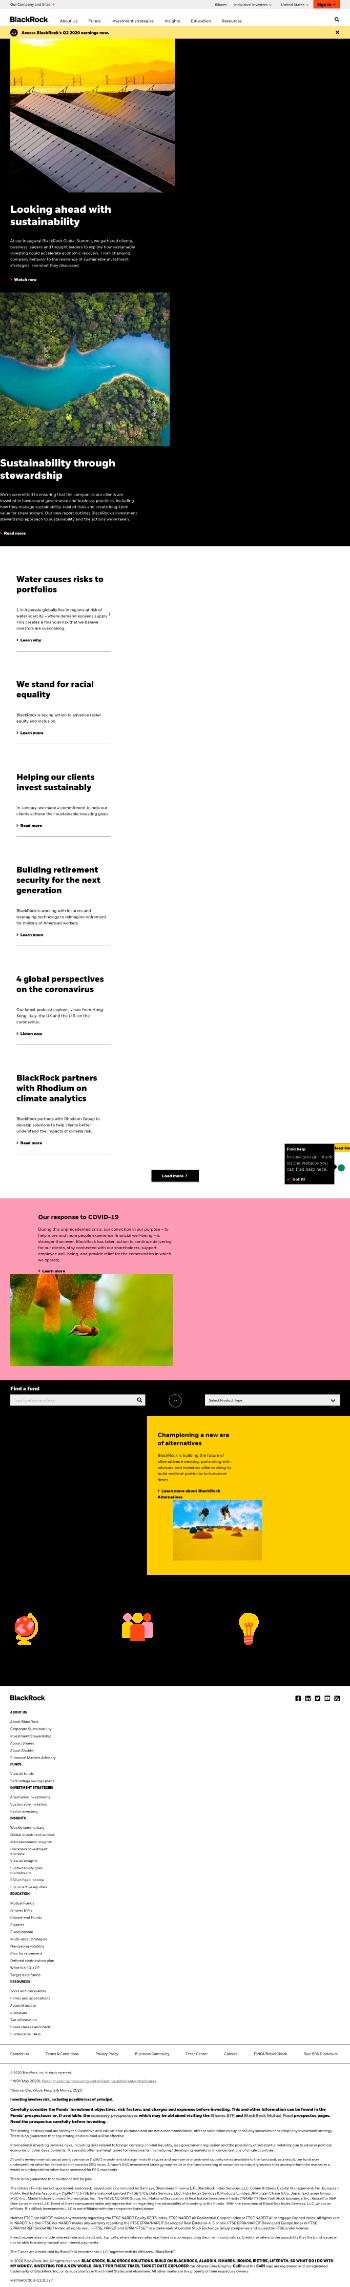 BlackRock Science and Technology Trust Website Screenshot